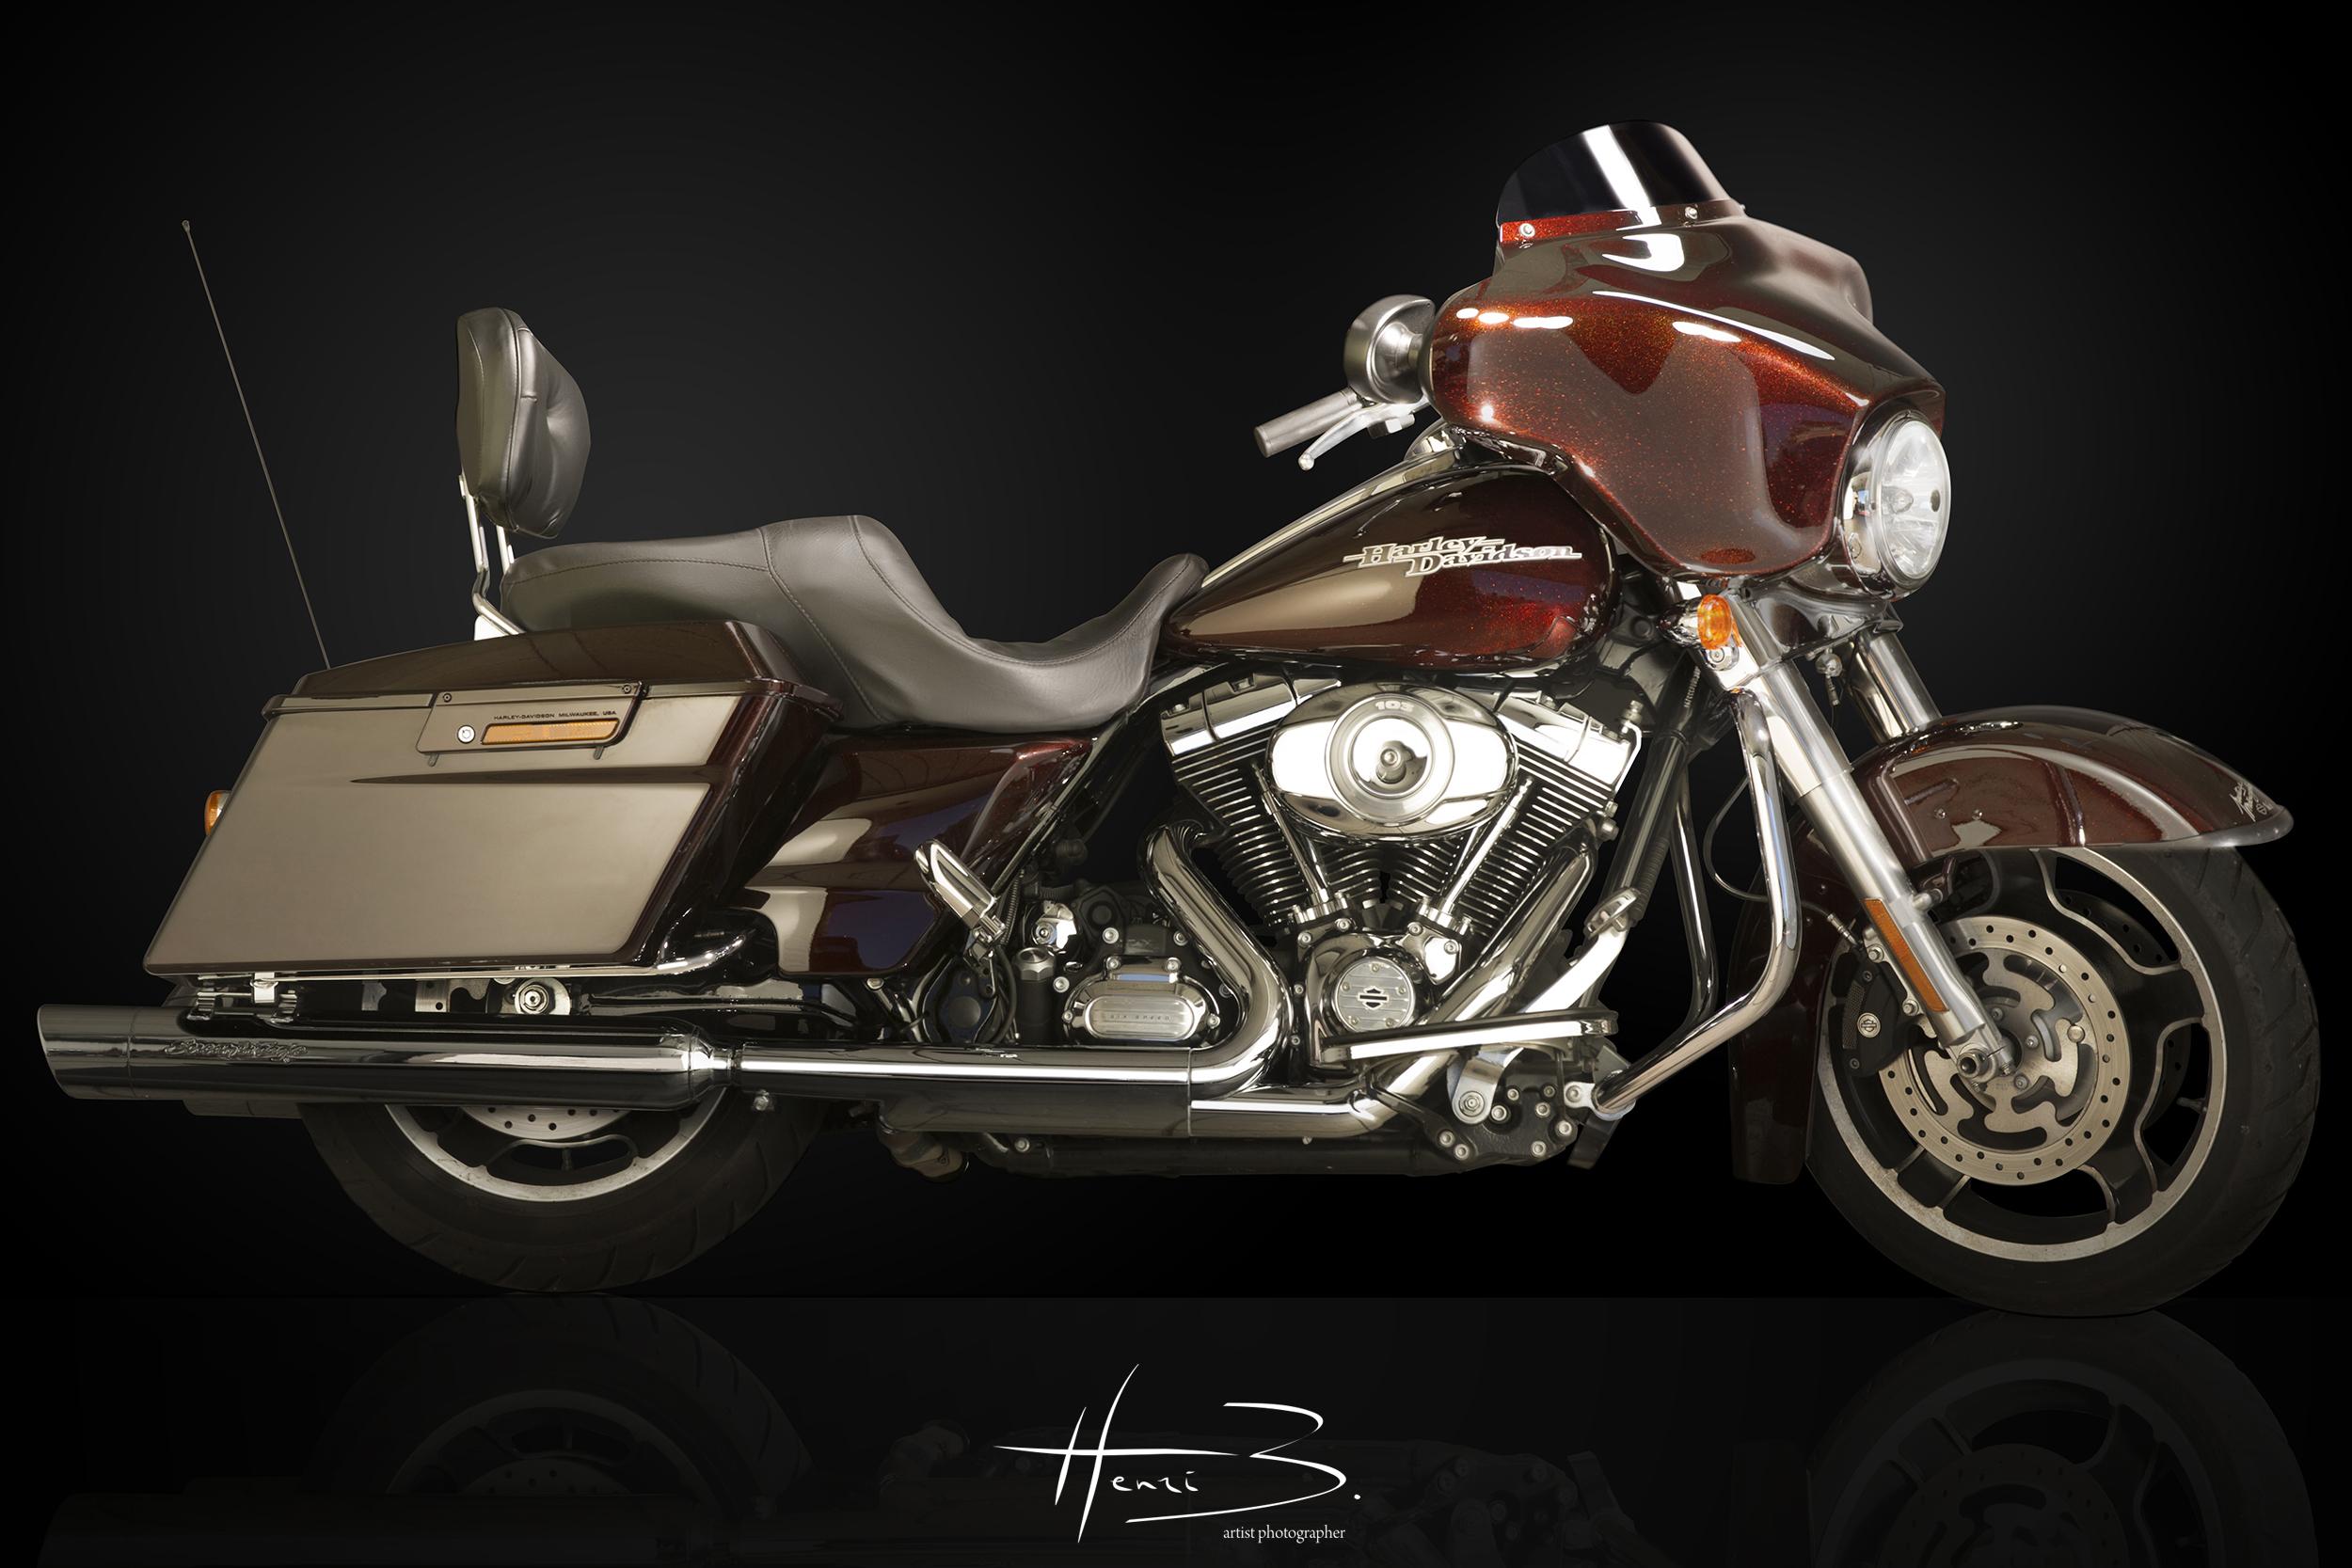 Harley-Davidson Street Glide 1800cc